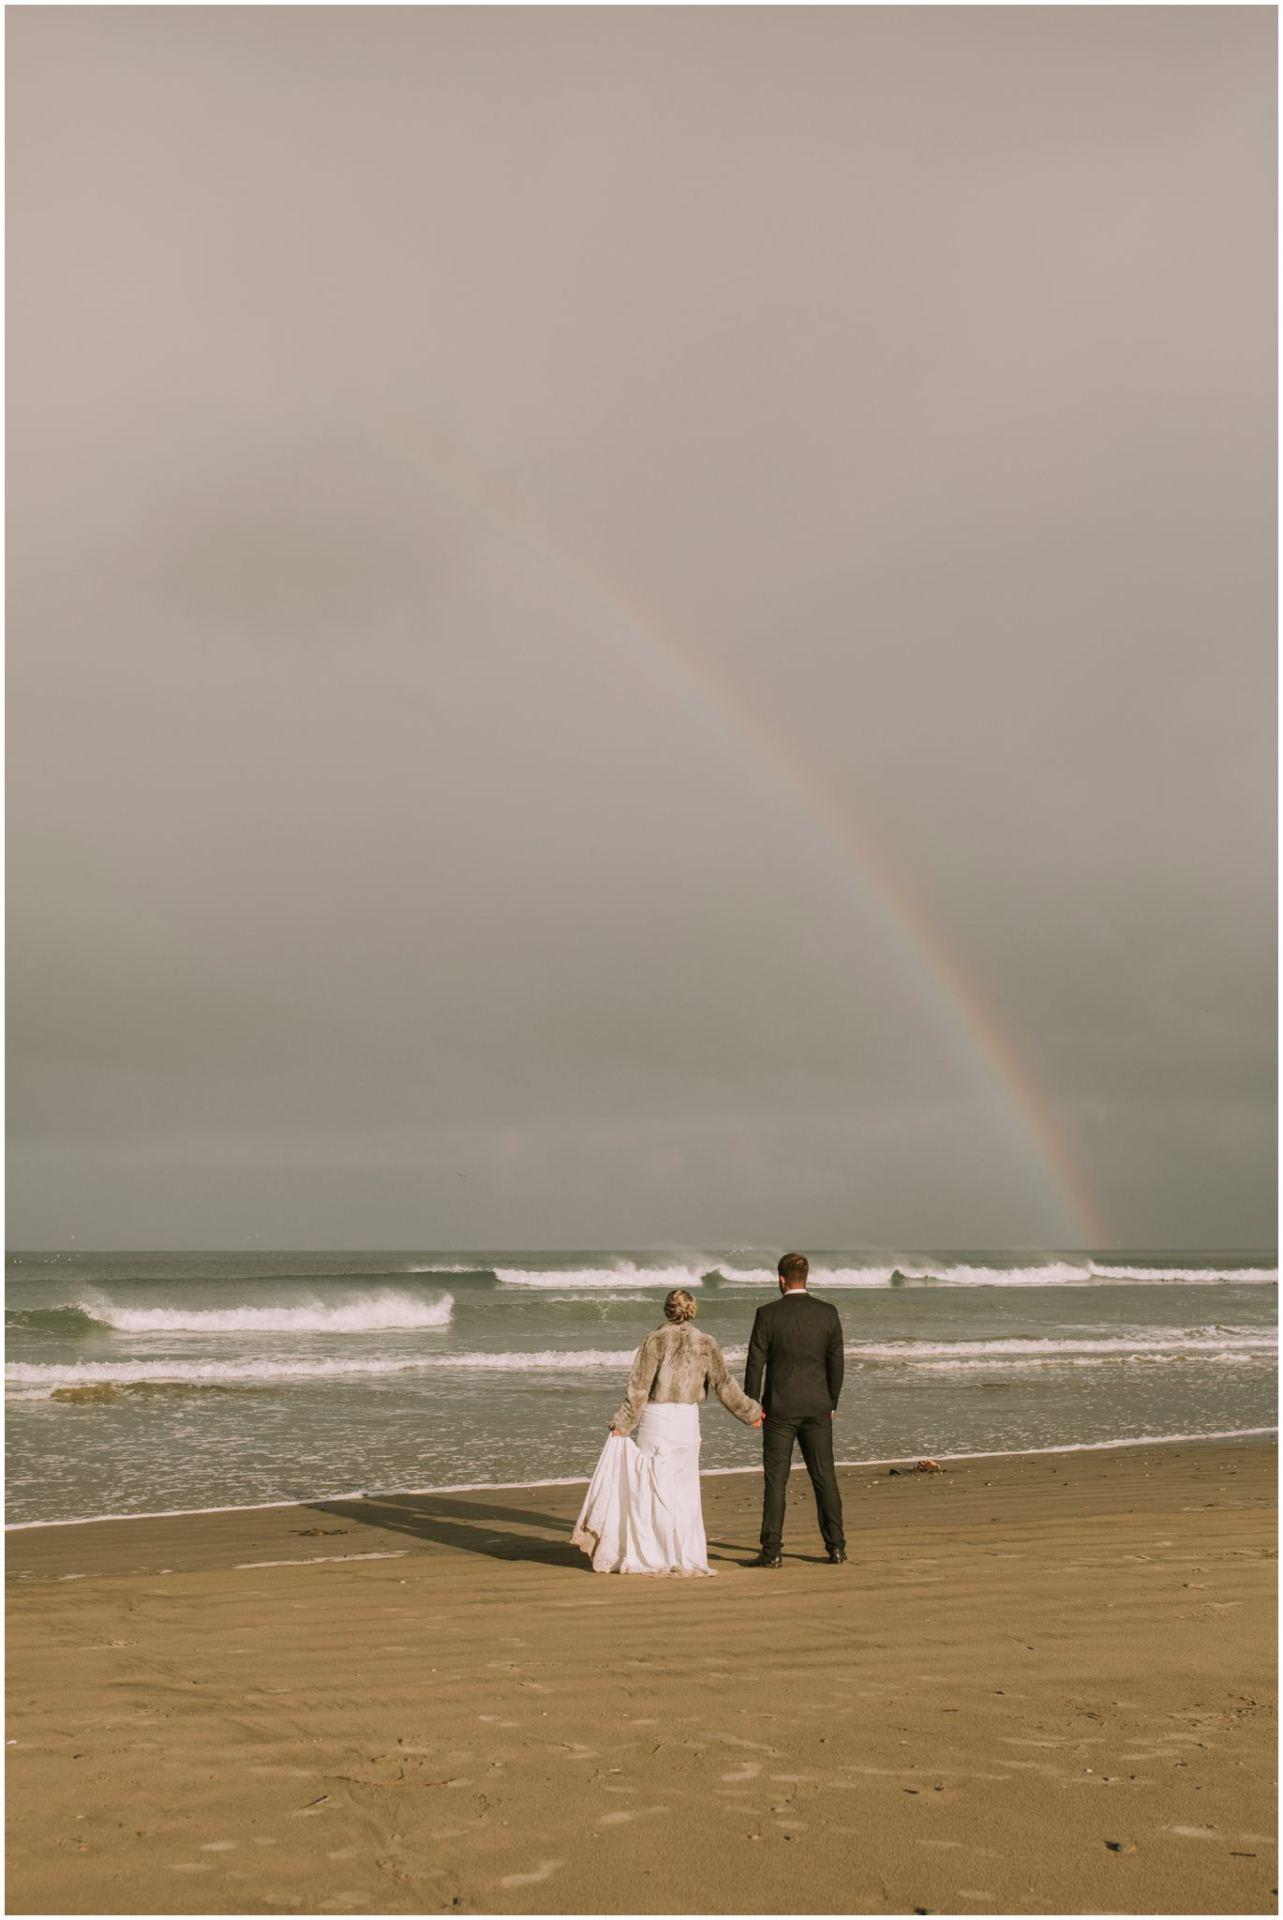 The Catlins rainbow